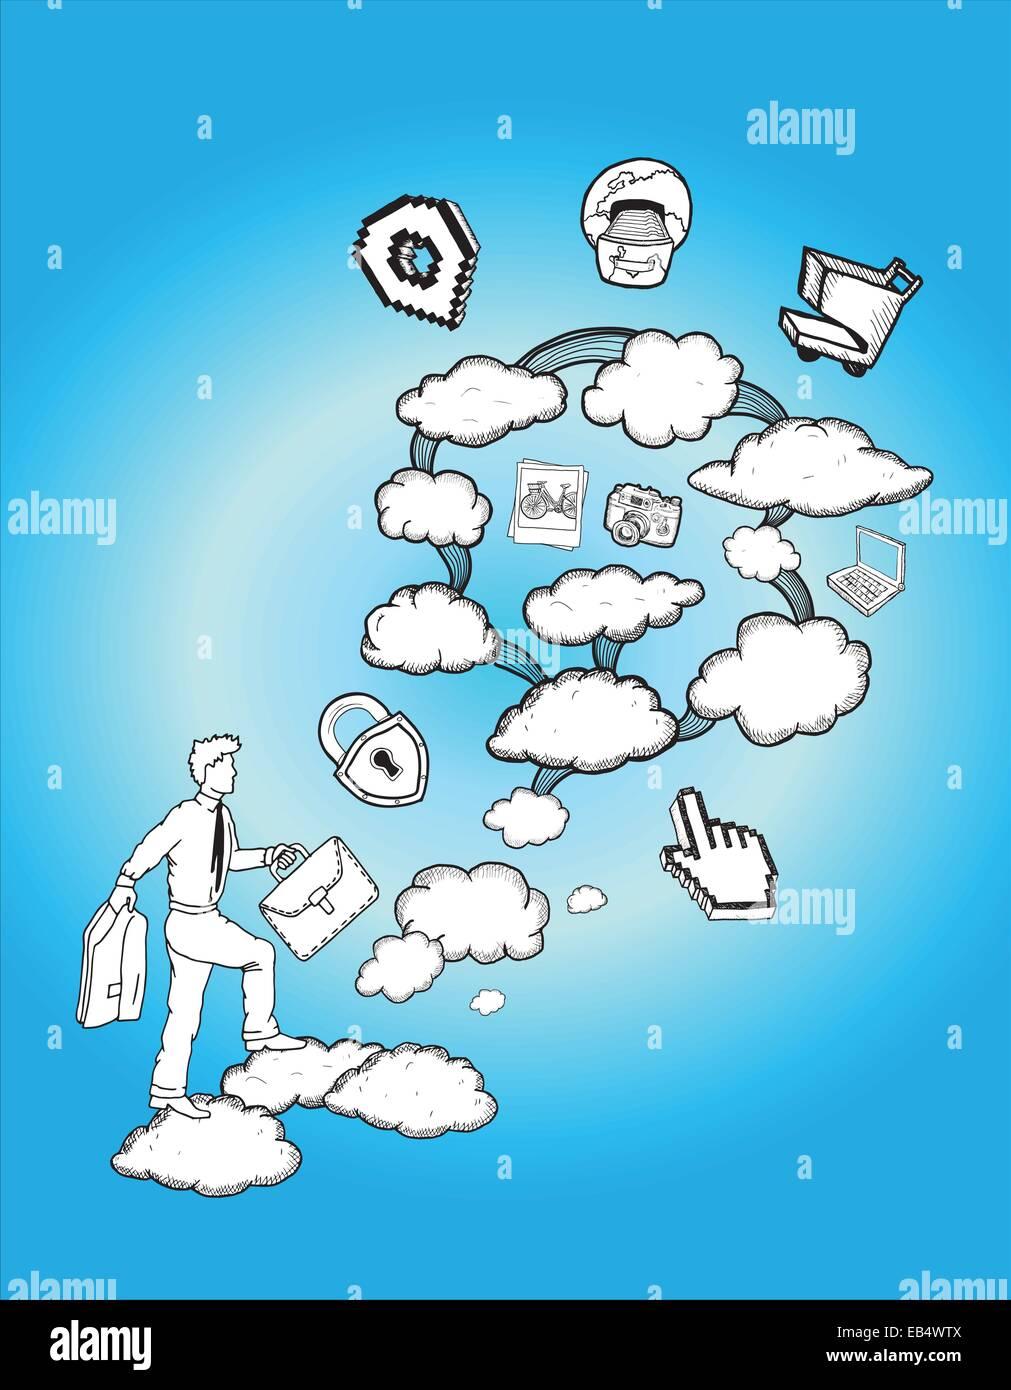 Cloud computing concept illustration - Stock Image